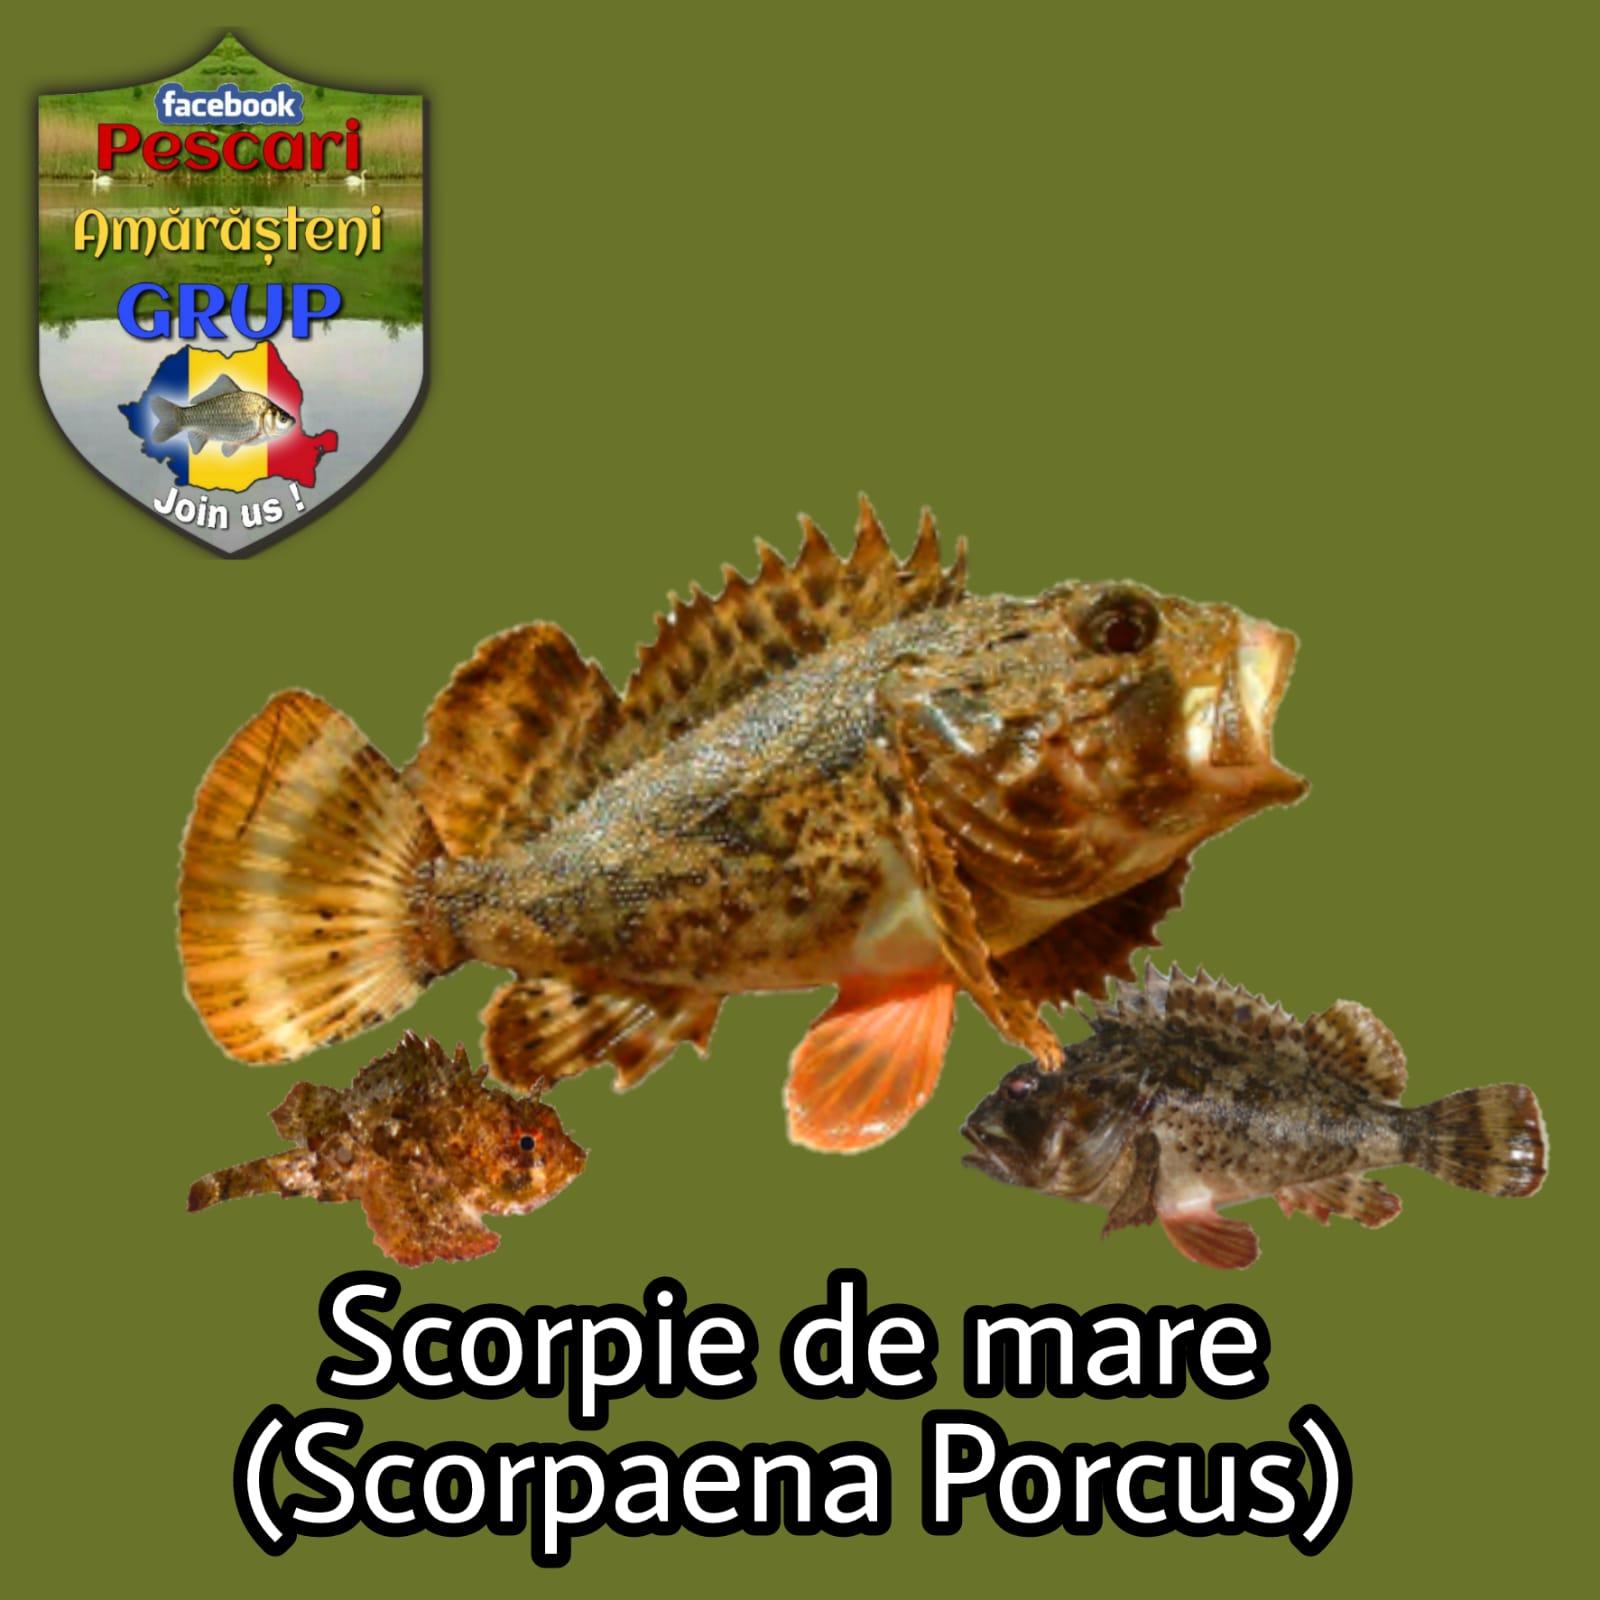 Scorpia de mare (Scarpoena porcus)